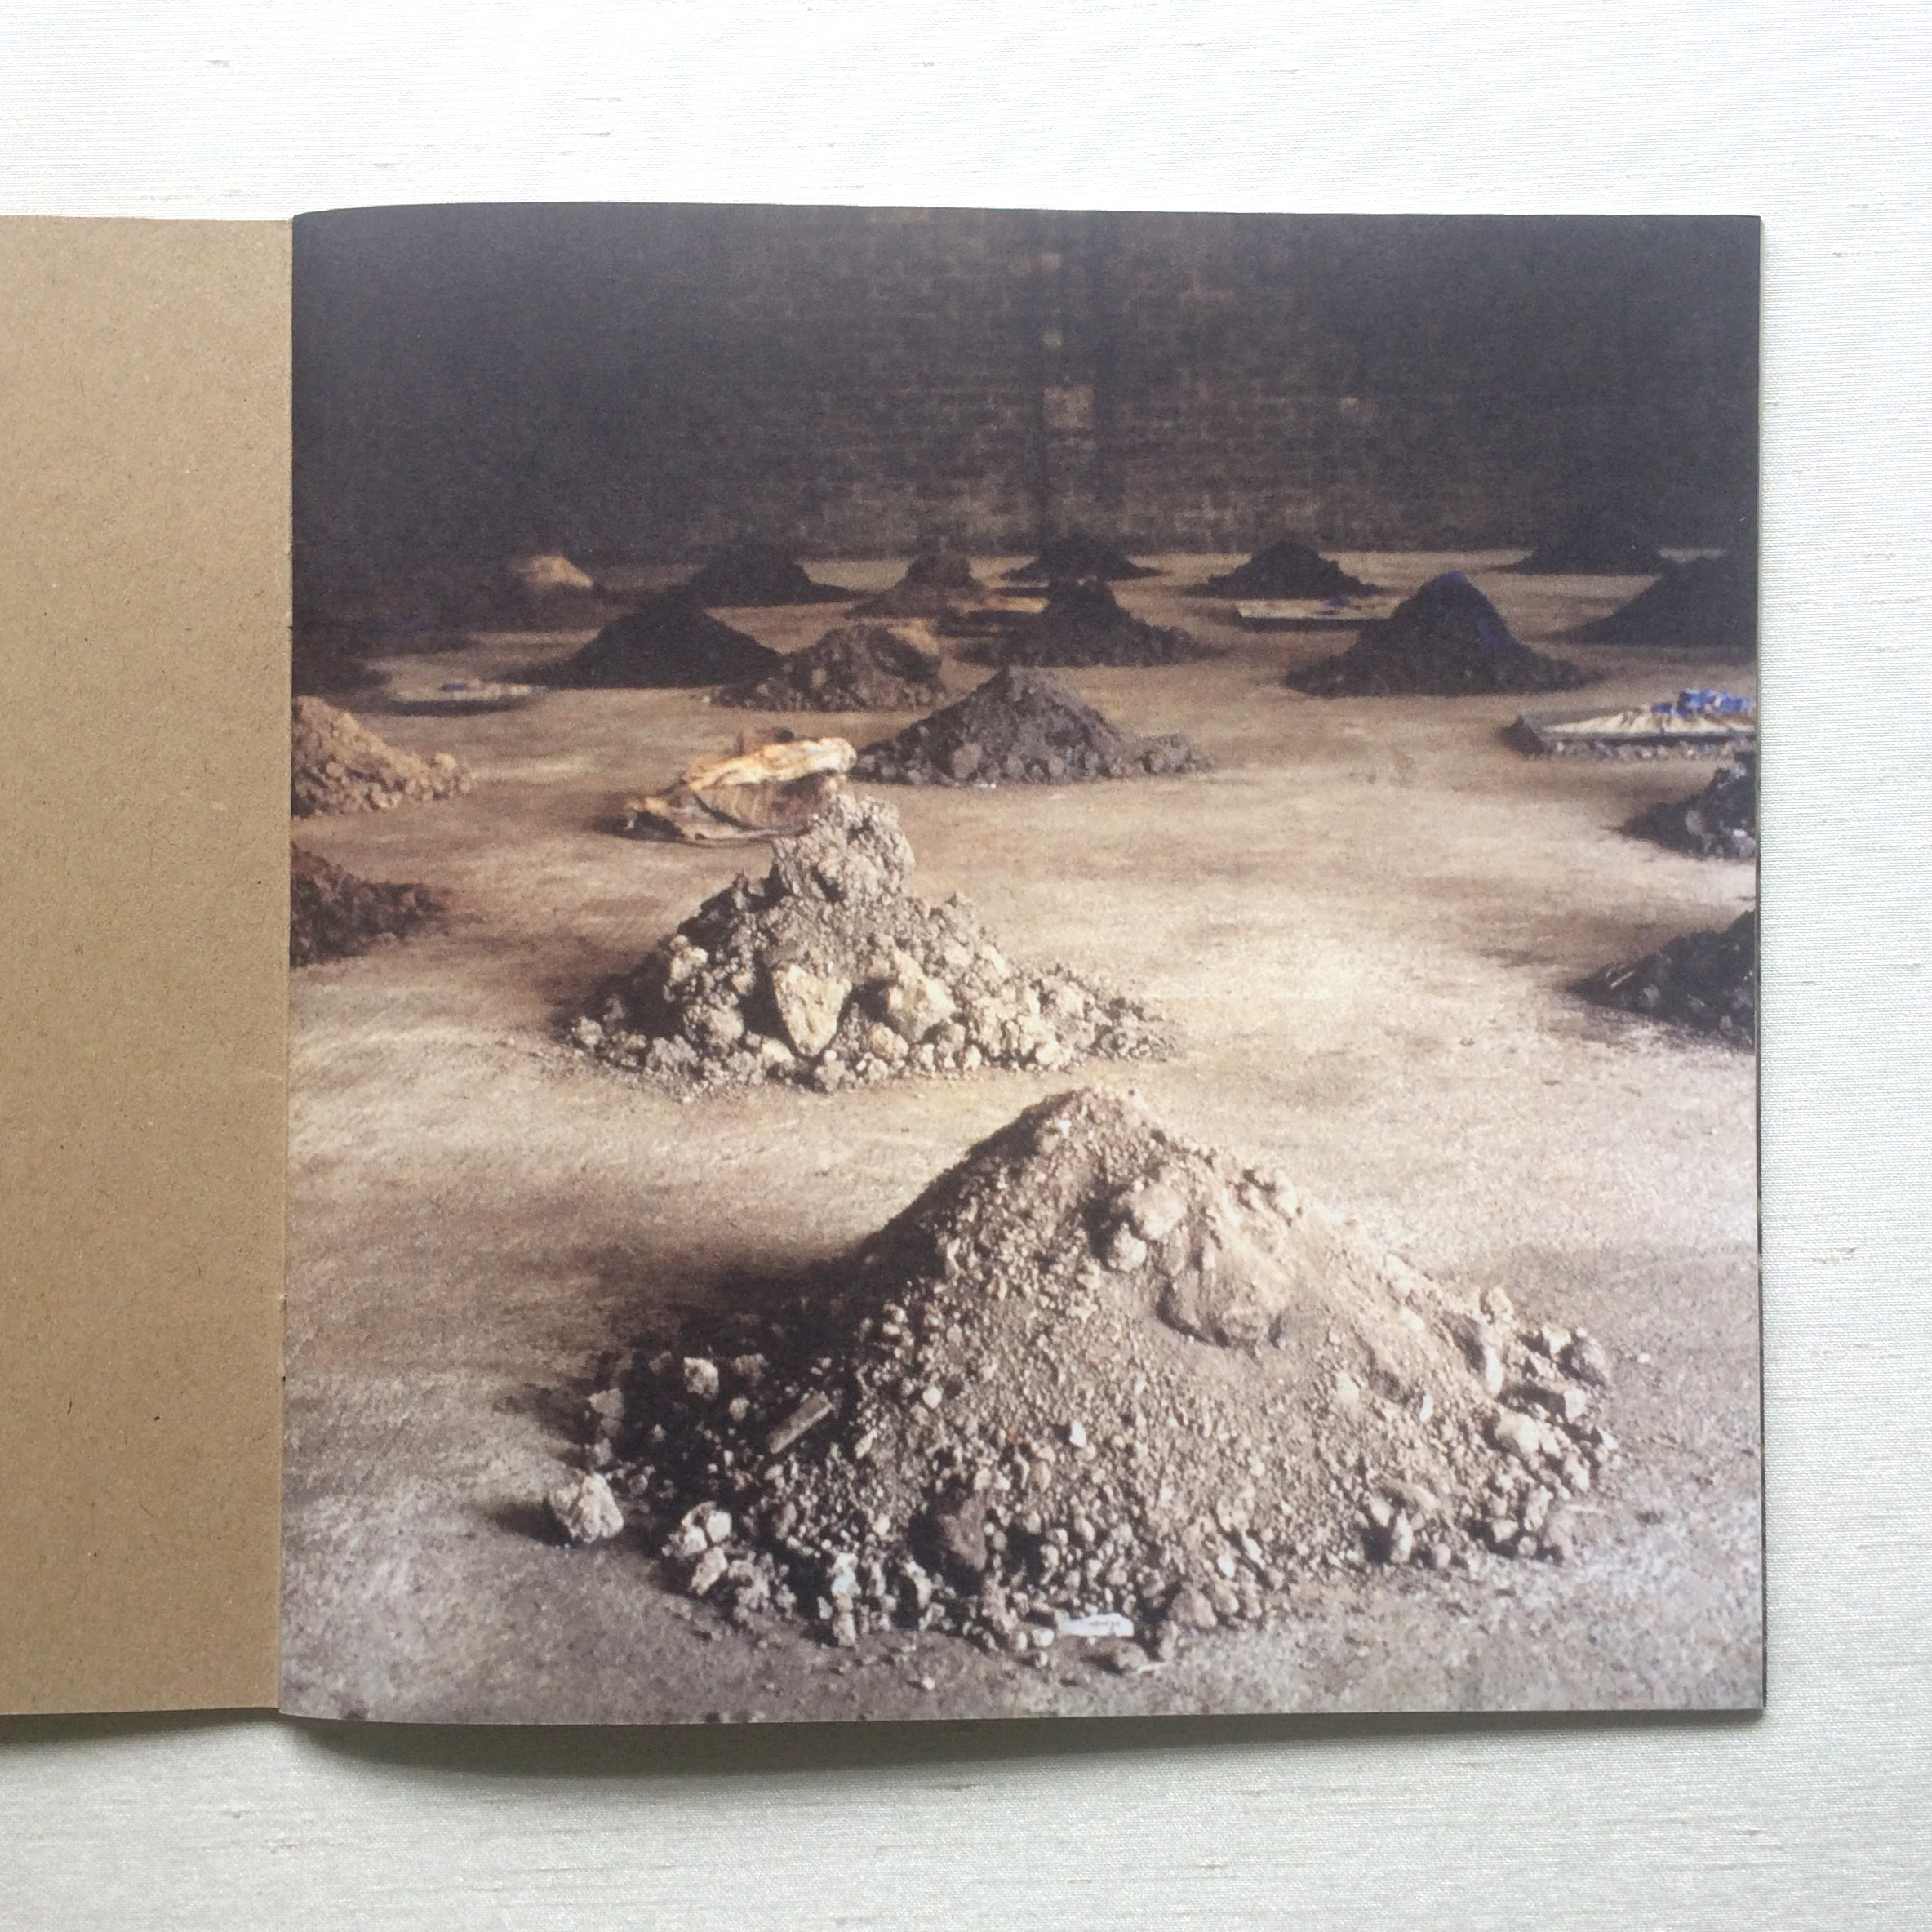 First page of artist catalogue of Irish artist Patricia McKenna installation piece